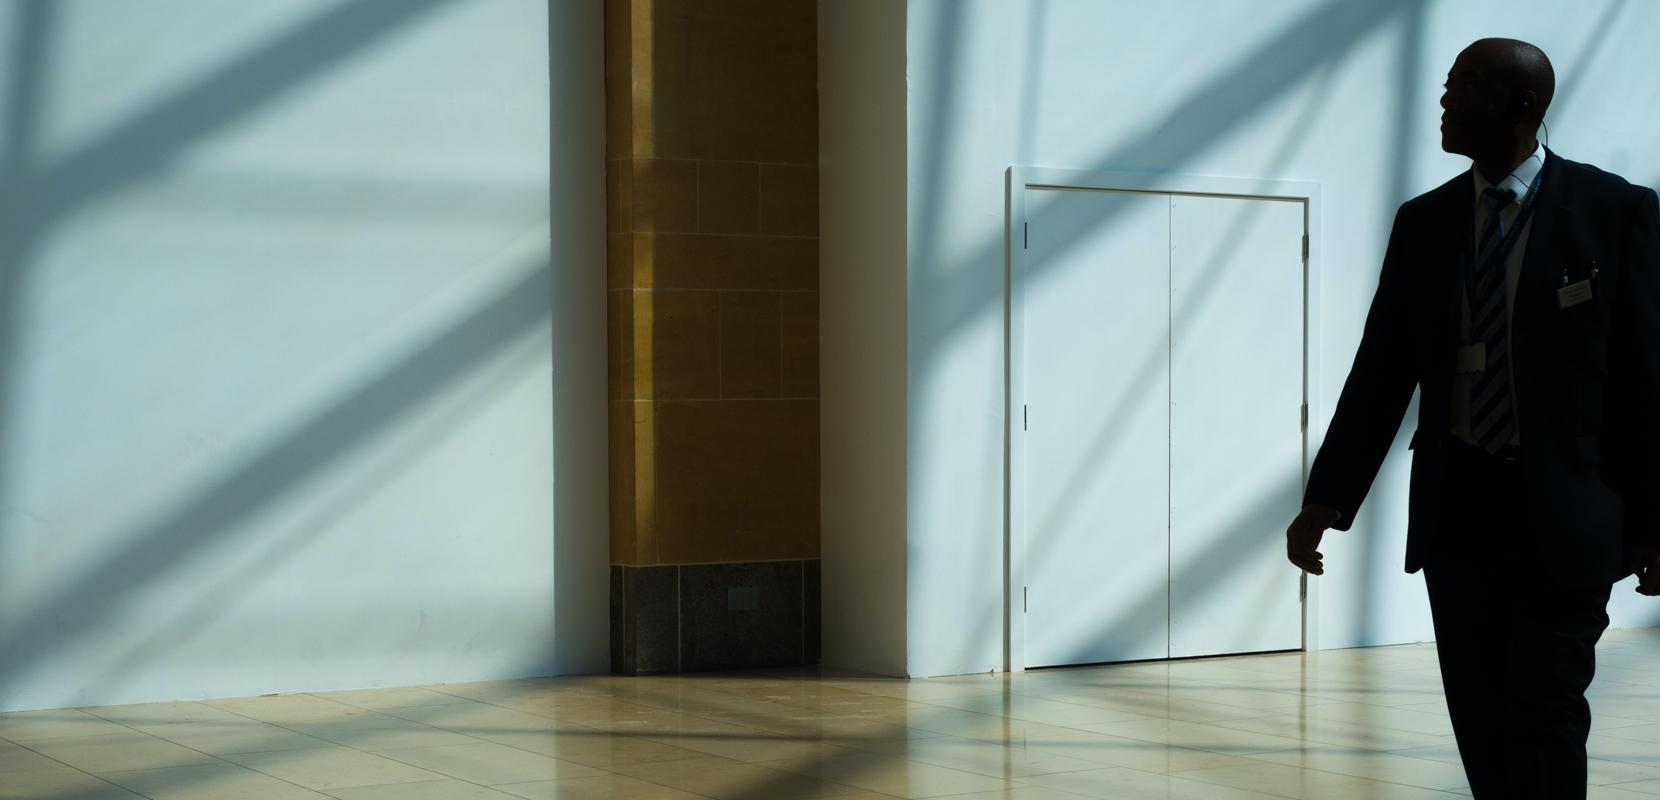 photo of man standing close to a door